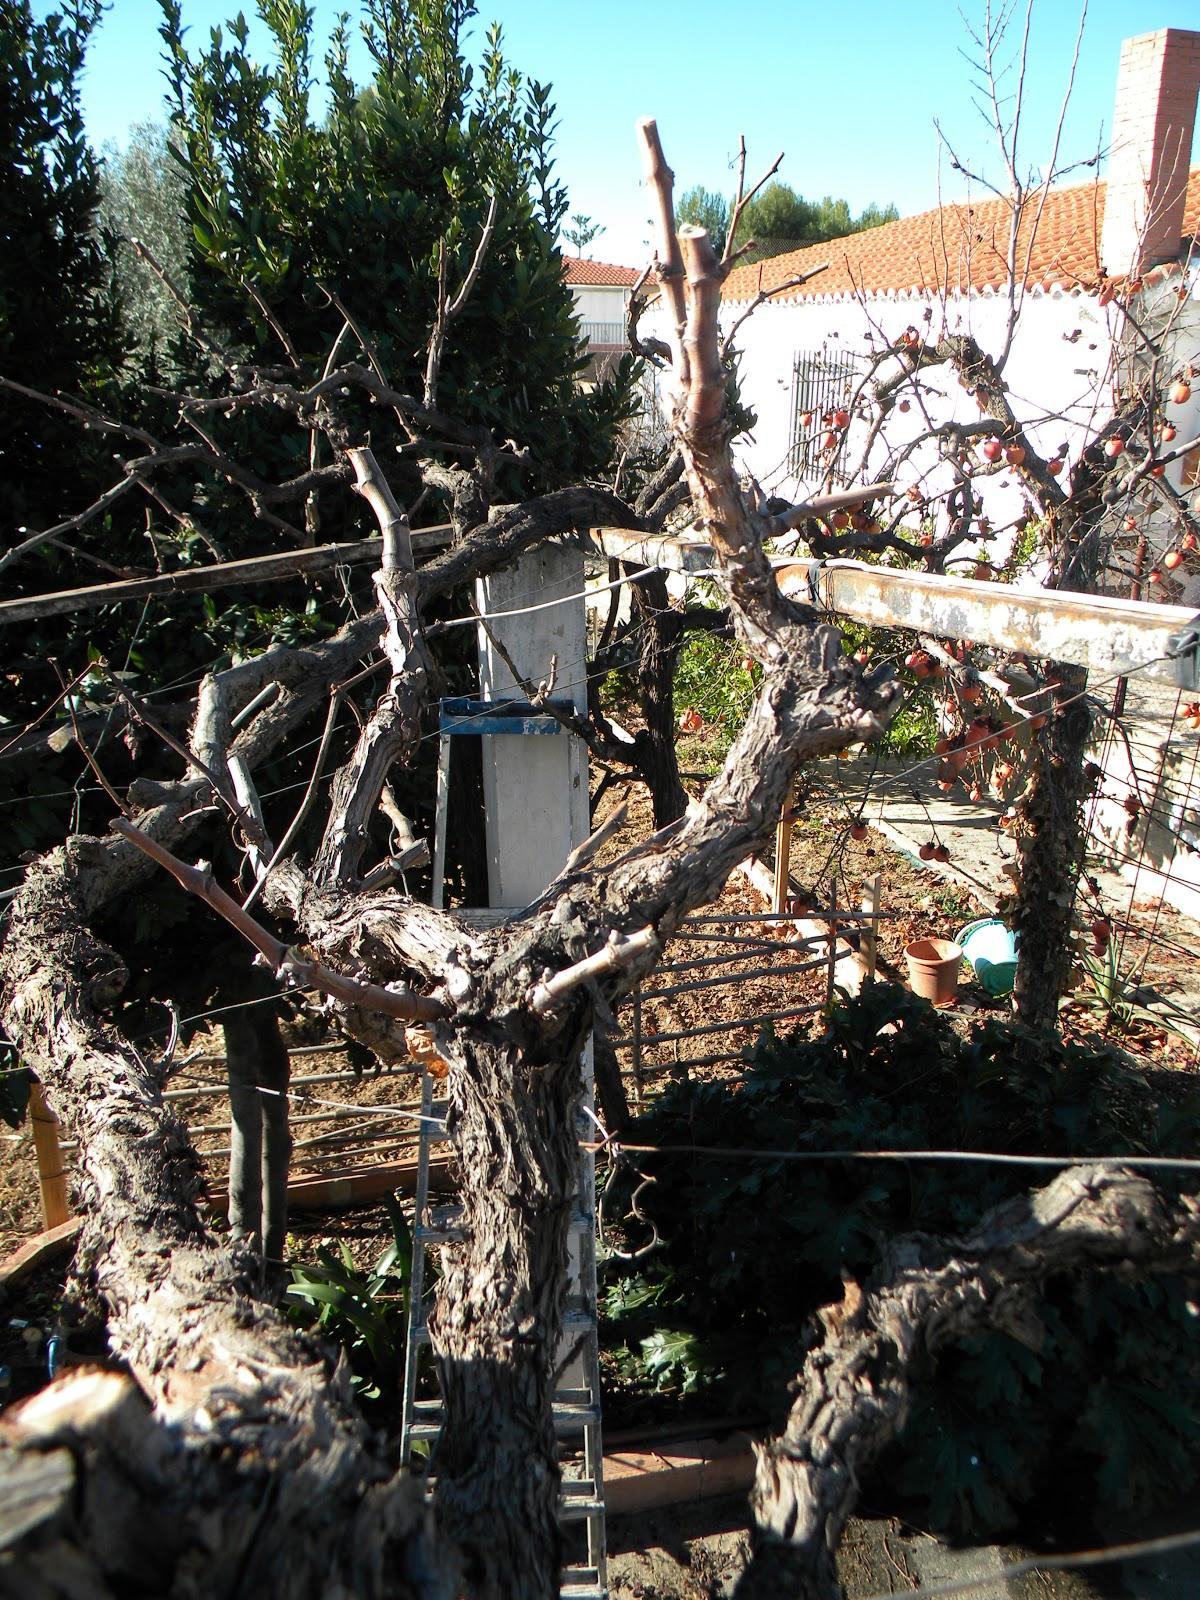 El huerto de tatay poda parra de uva blanca - Poda de hortensias epoca ...